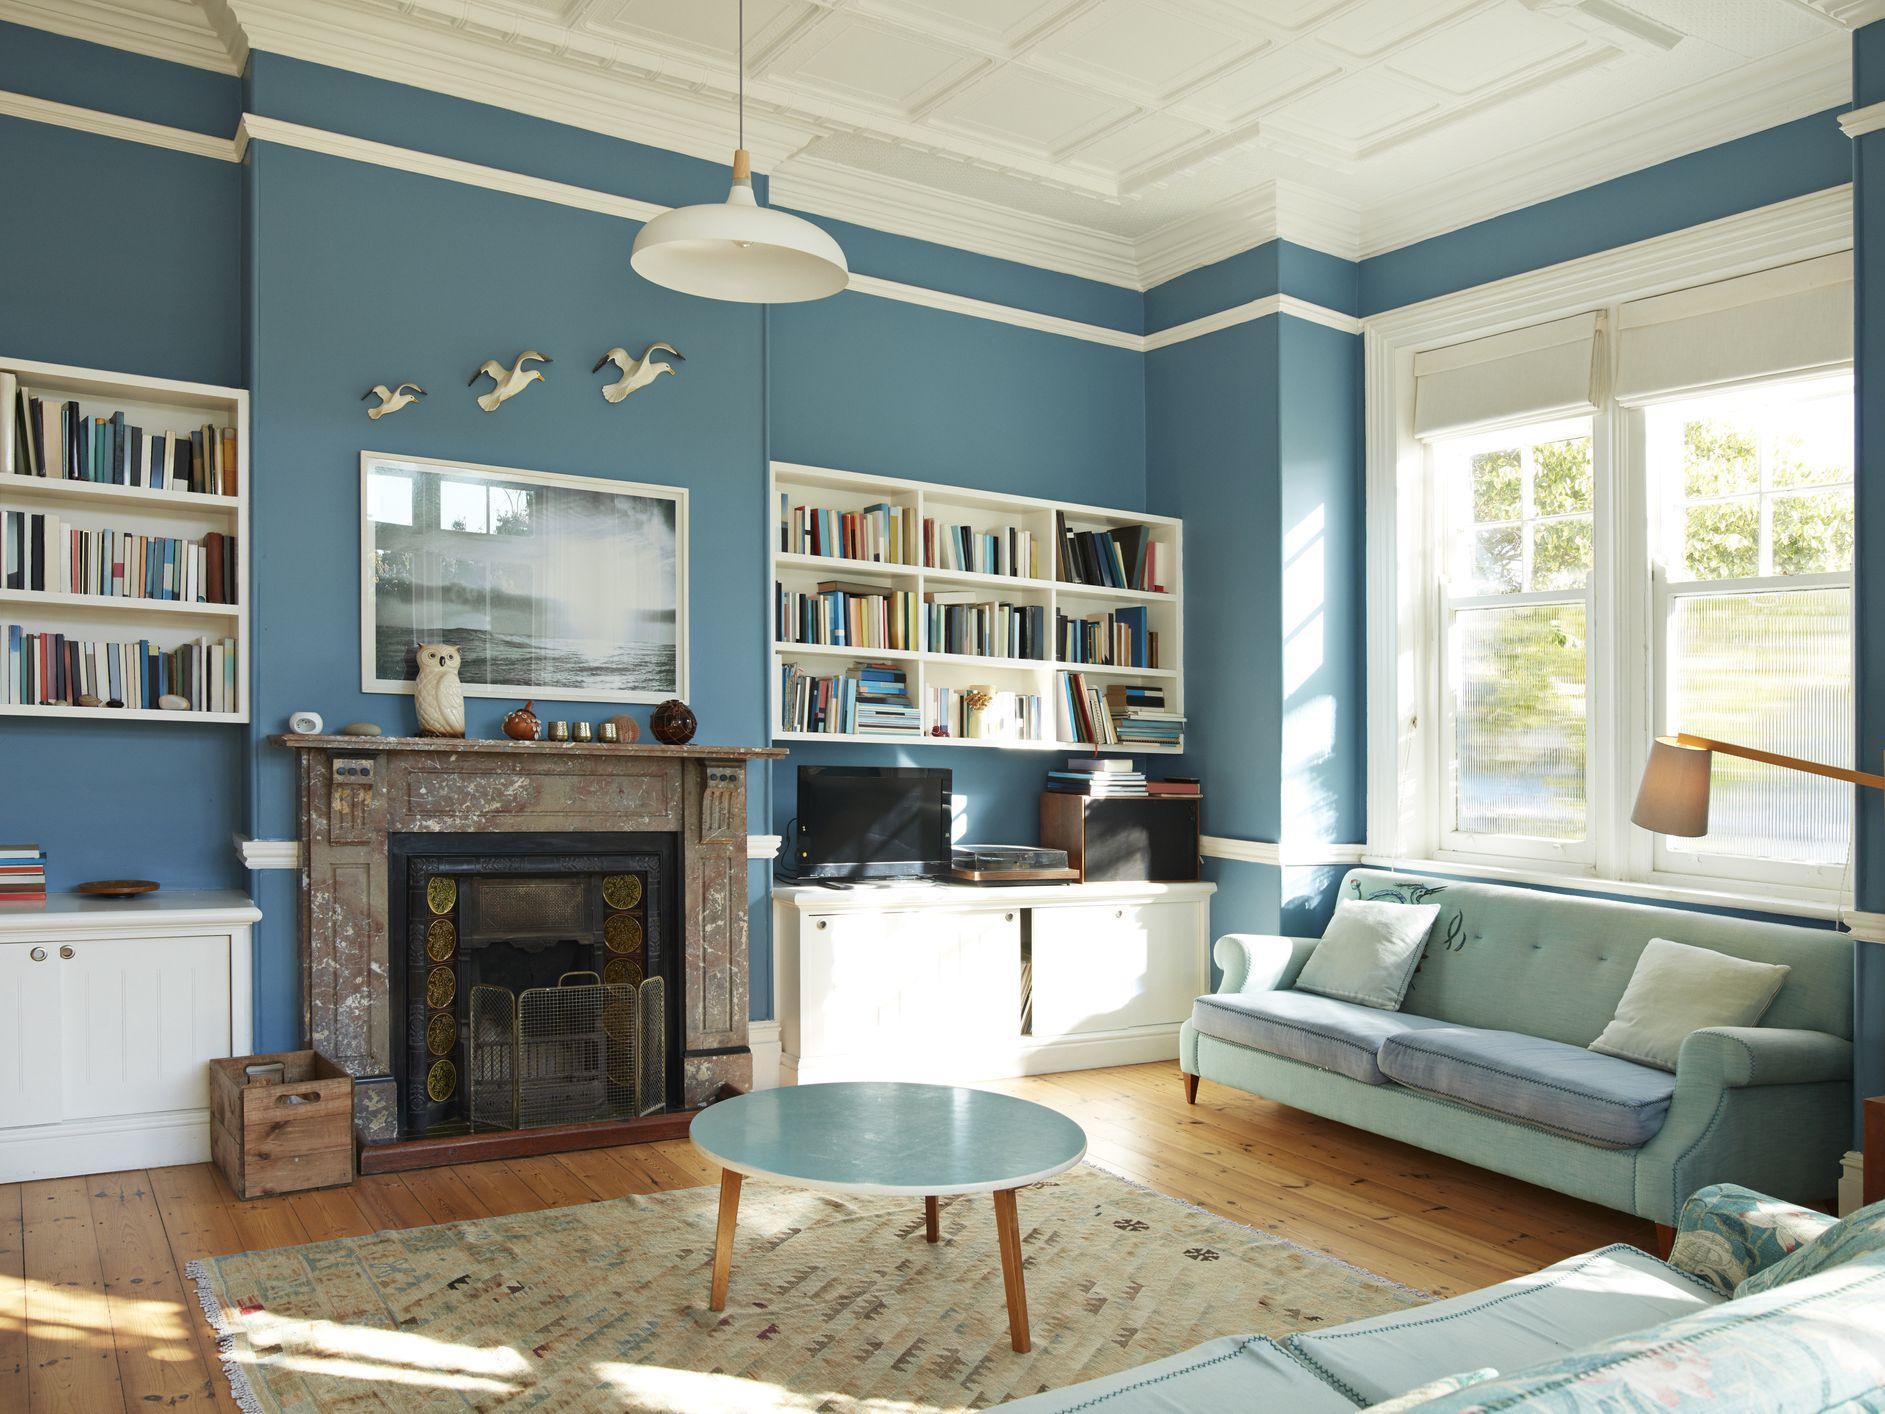 Design Balance And Room Decorating